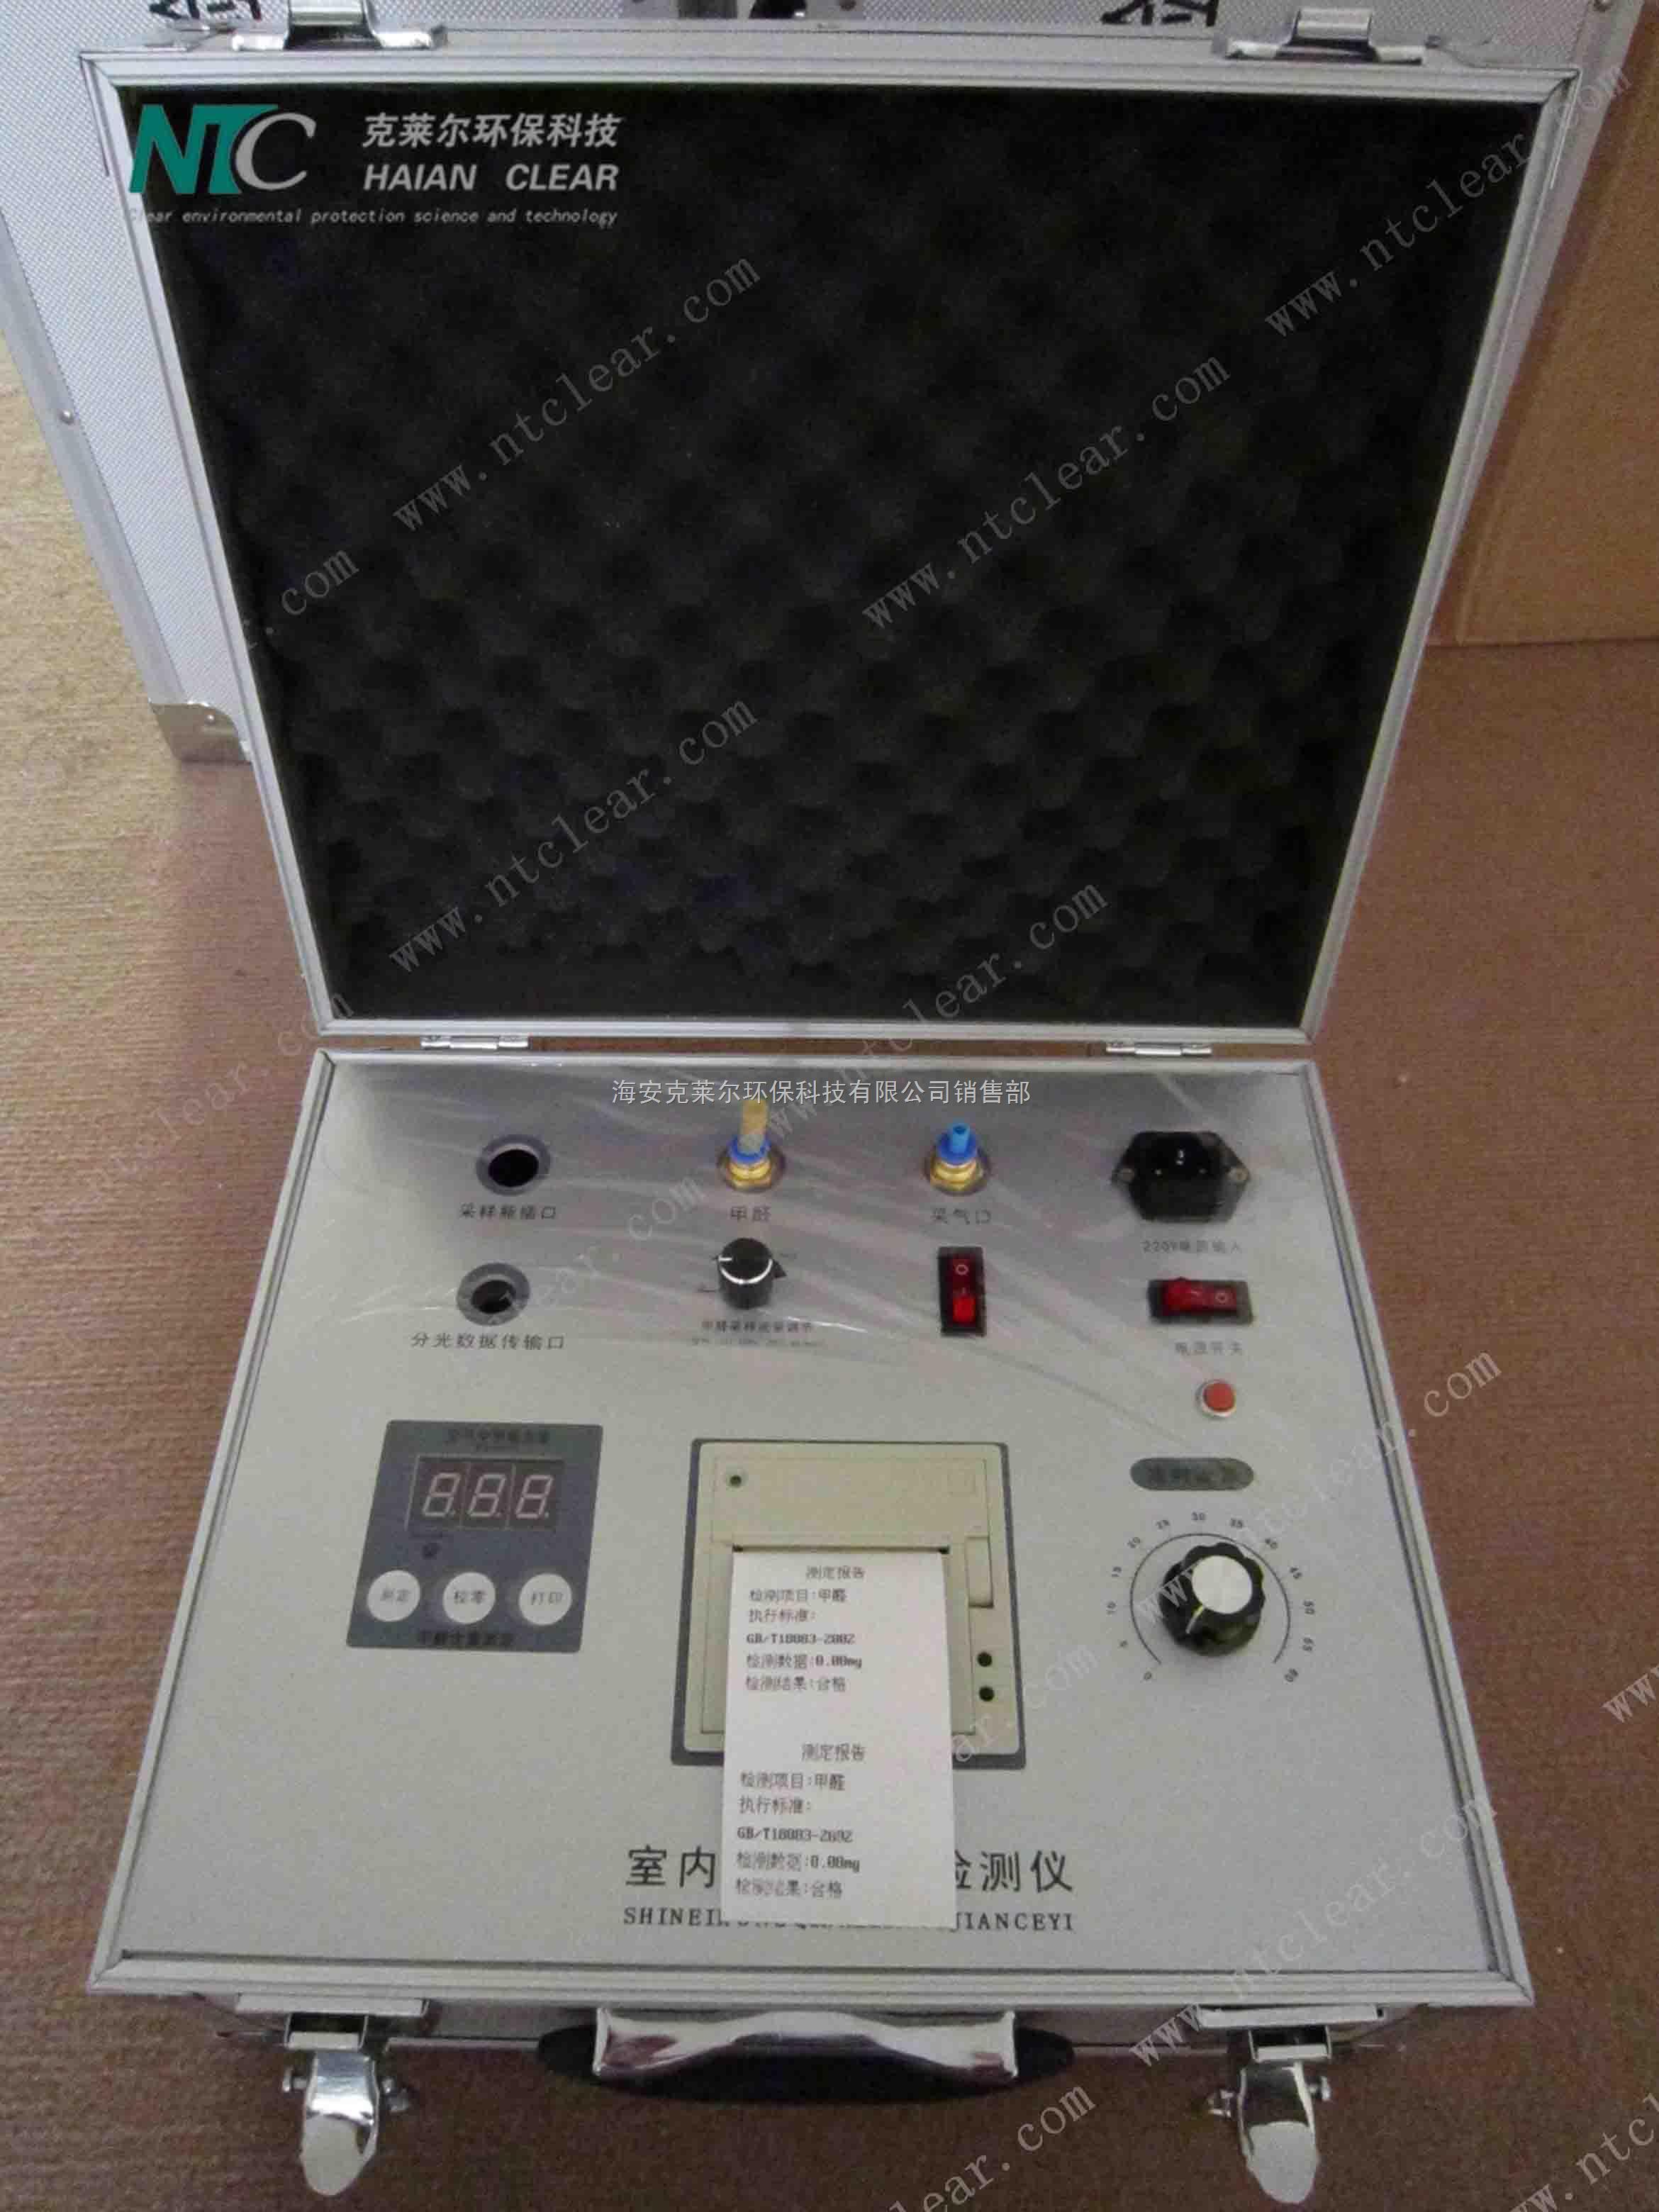 NTC-1-福建 厦门 三明家用甲醛检测仪|便携式甲醛检测仪|安利甲醛检测仪